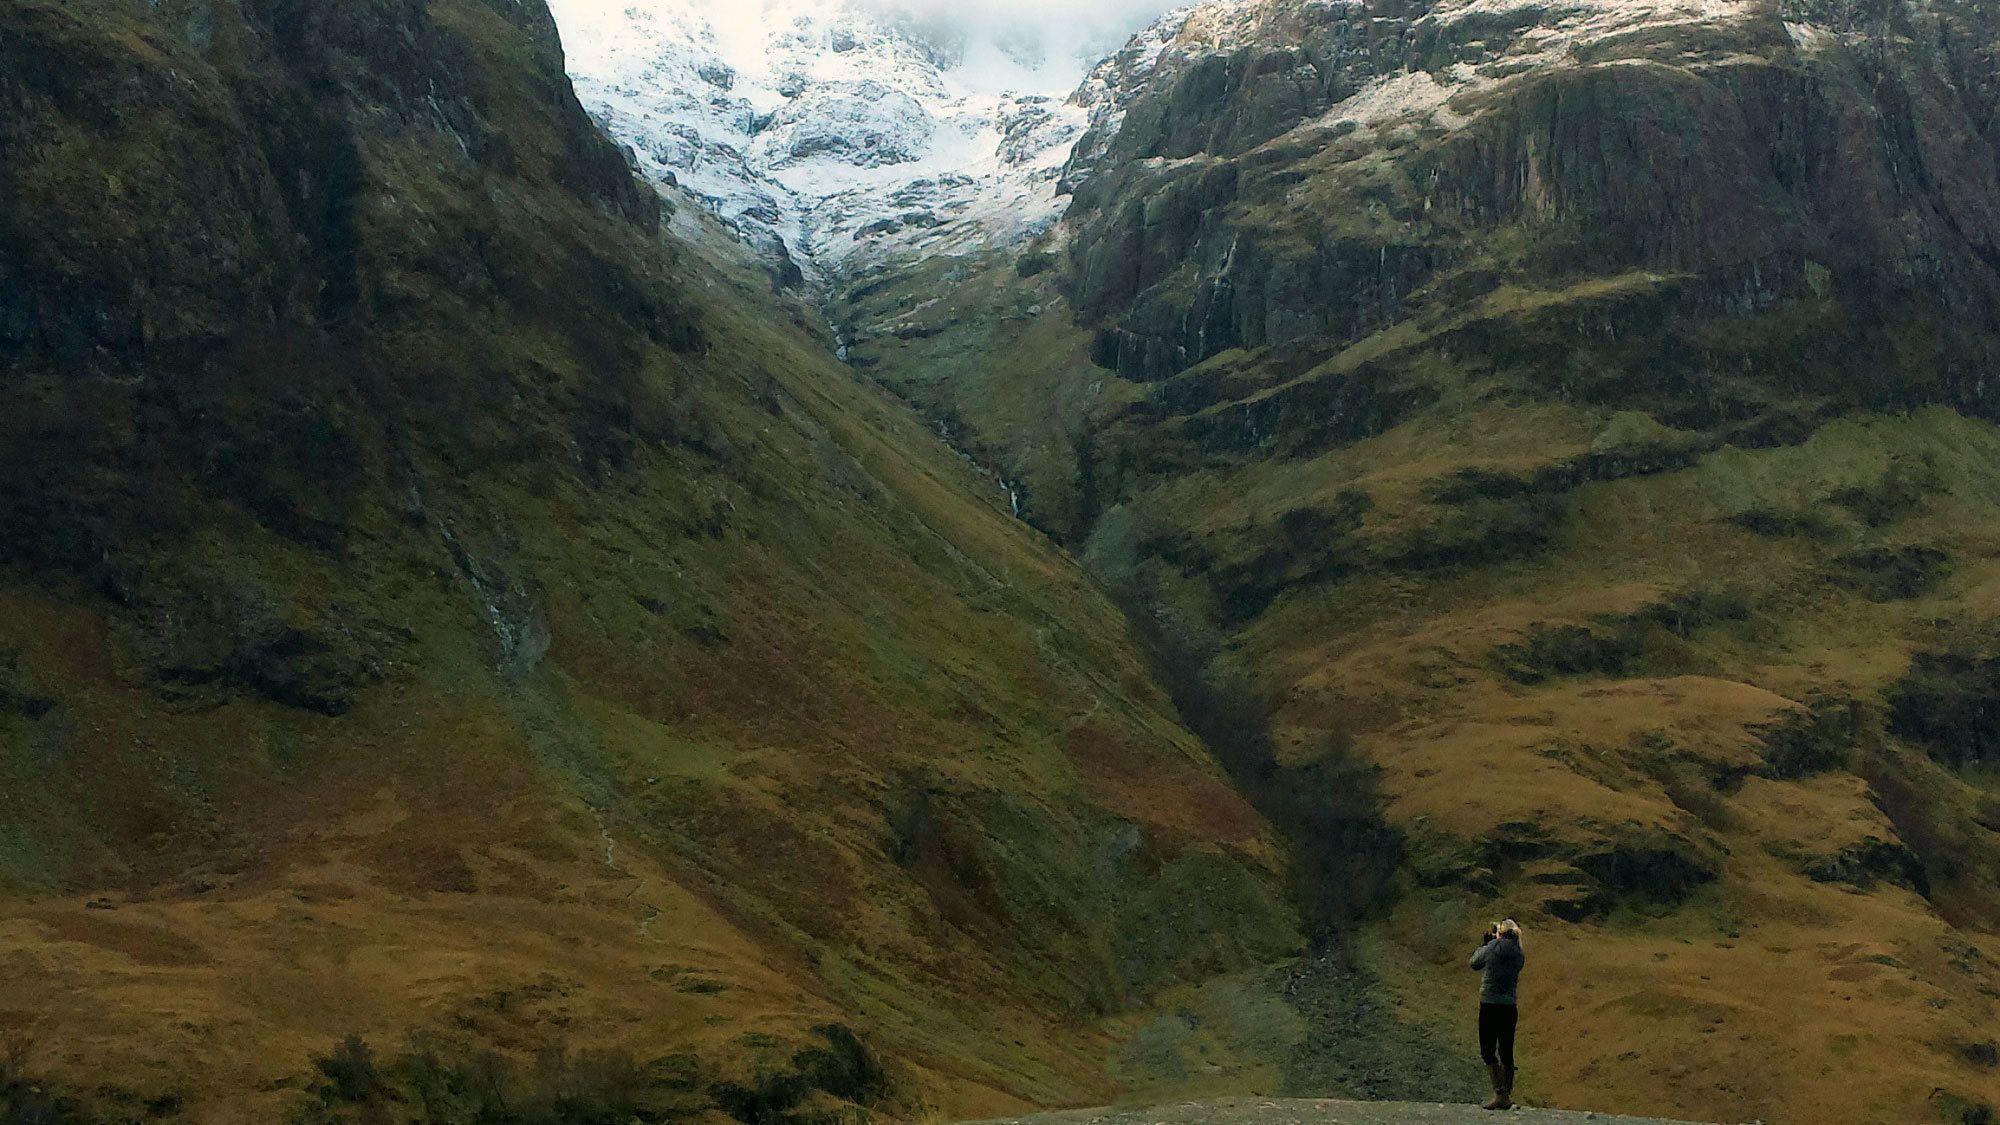 Oban, Glencoe & West Highland Castles Tour from Glasgow